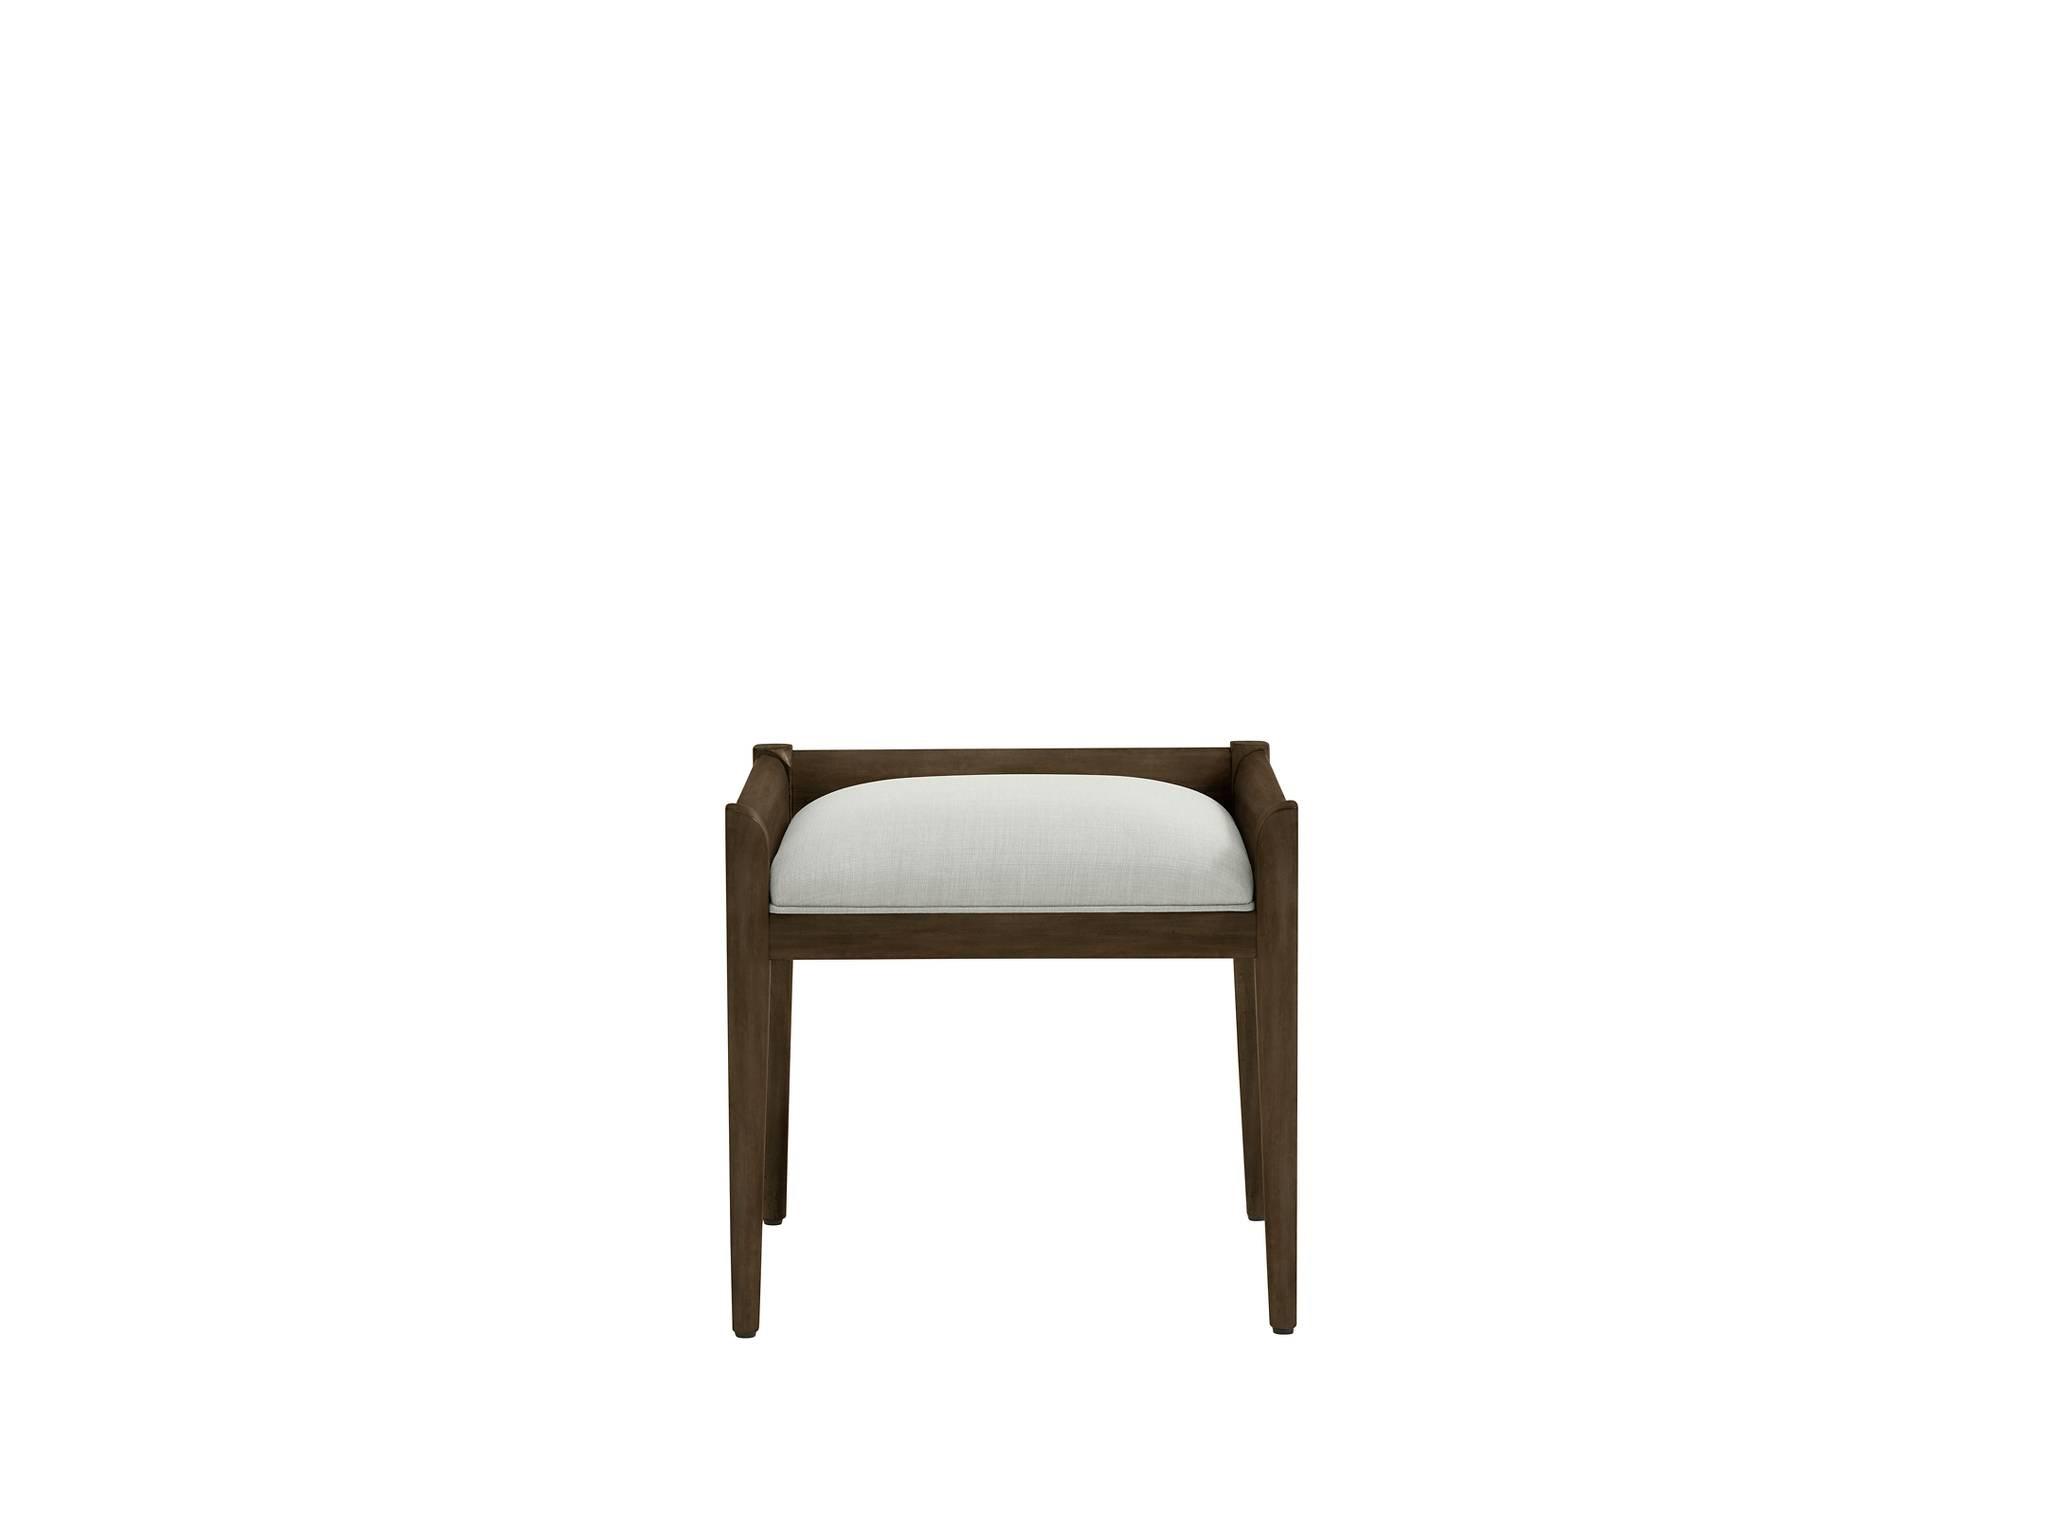 Stone U0026 Leigh Modern Desk Stool 584 13 73